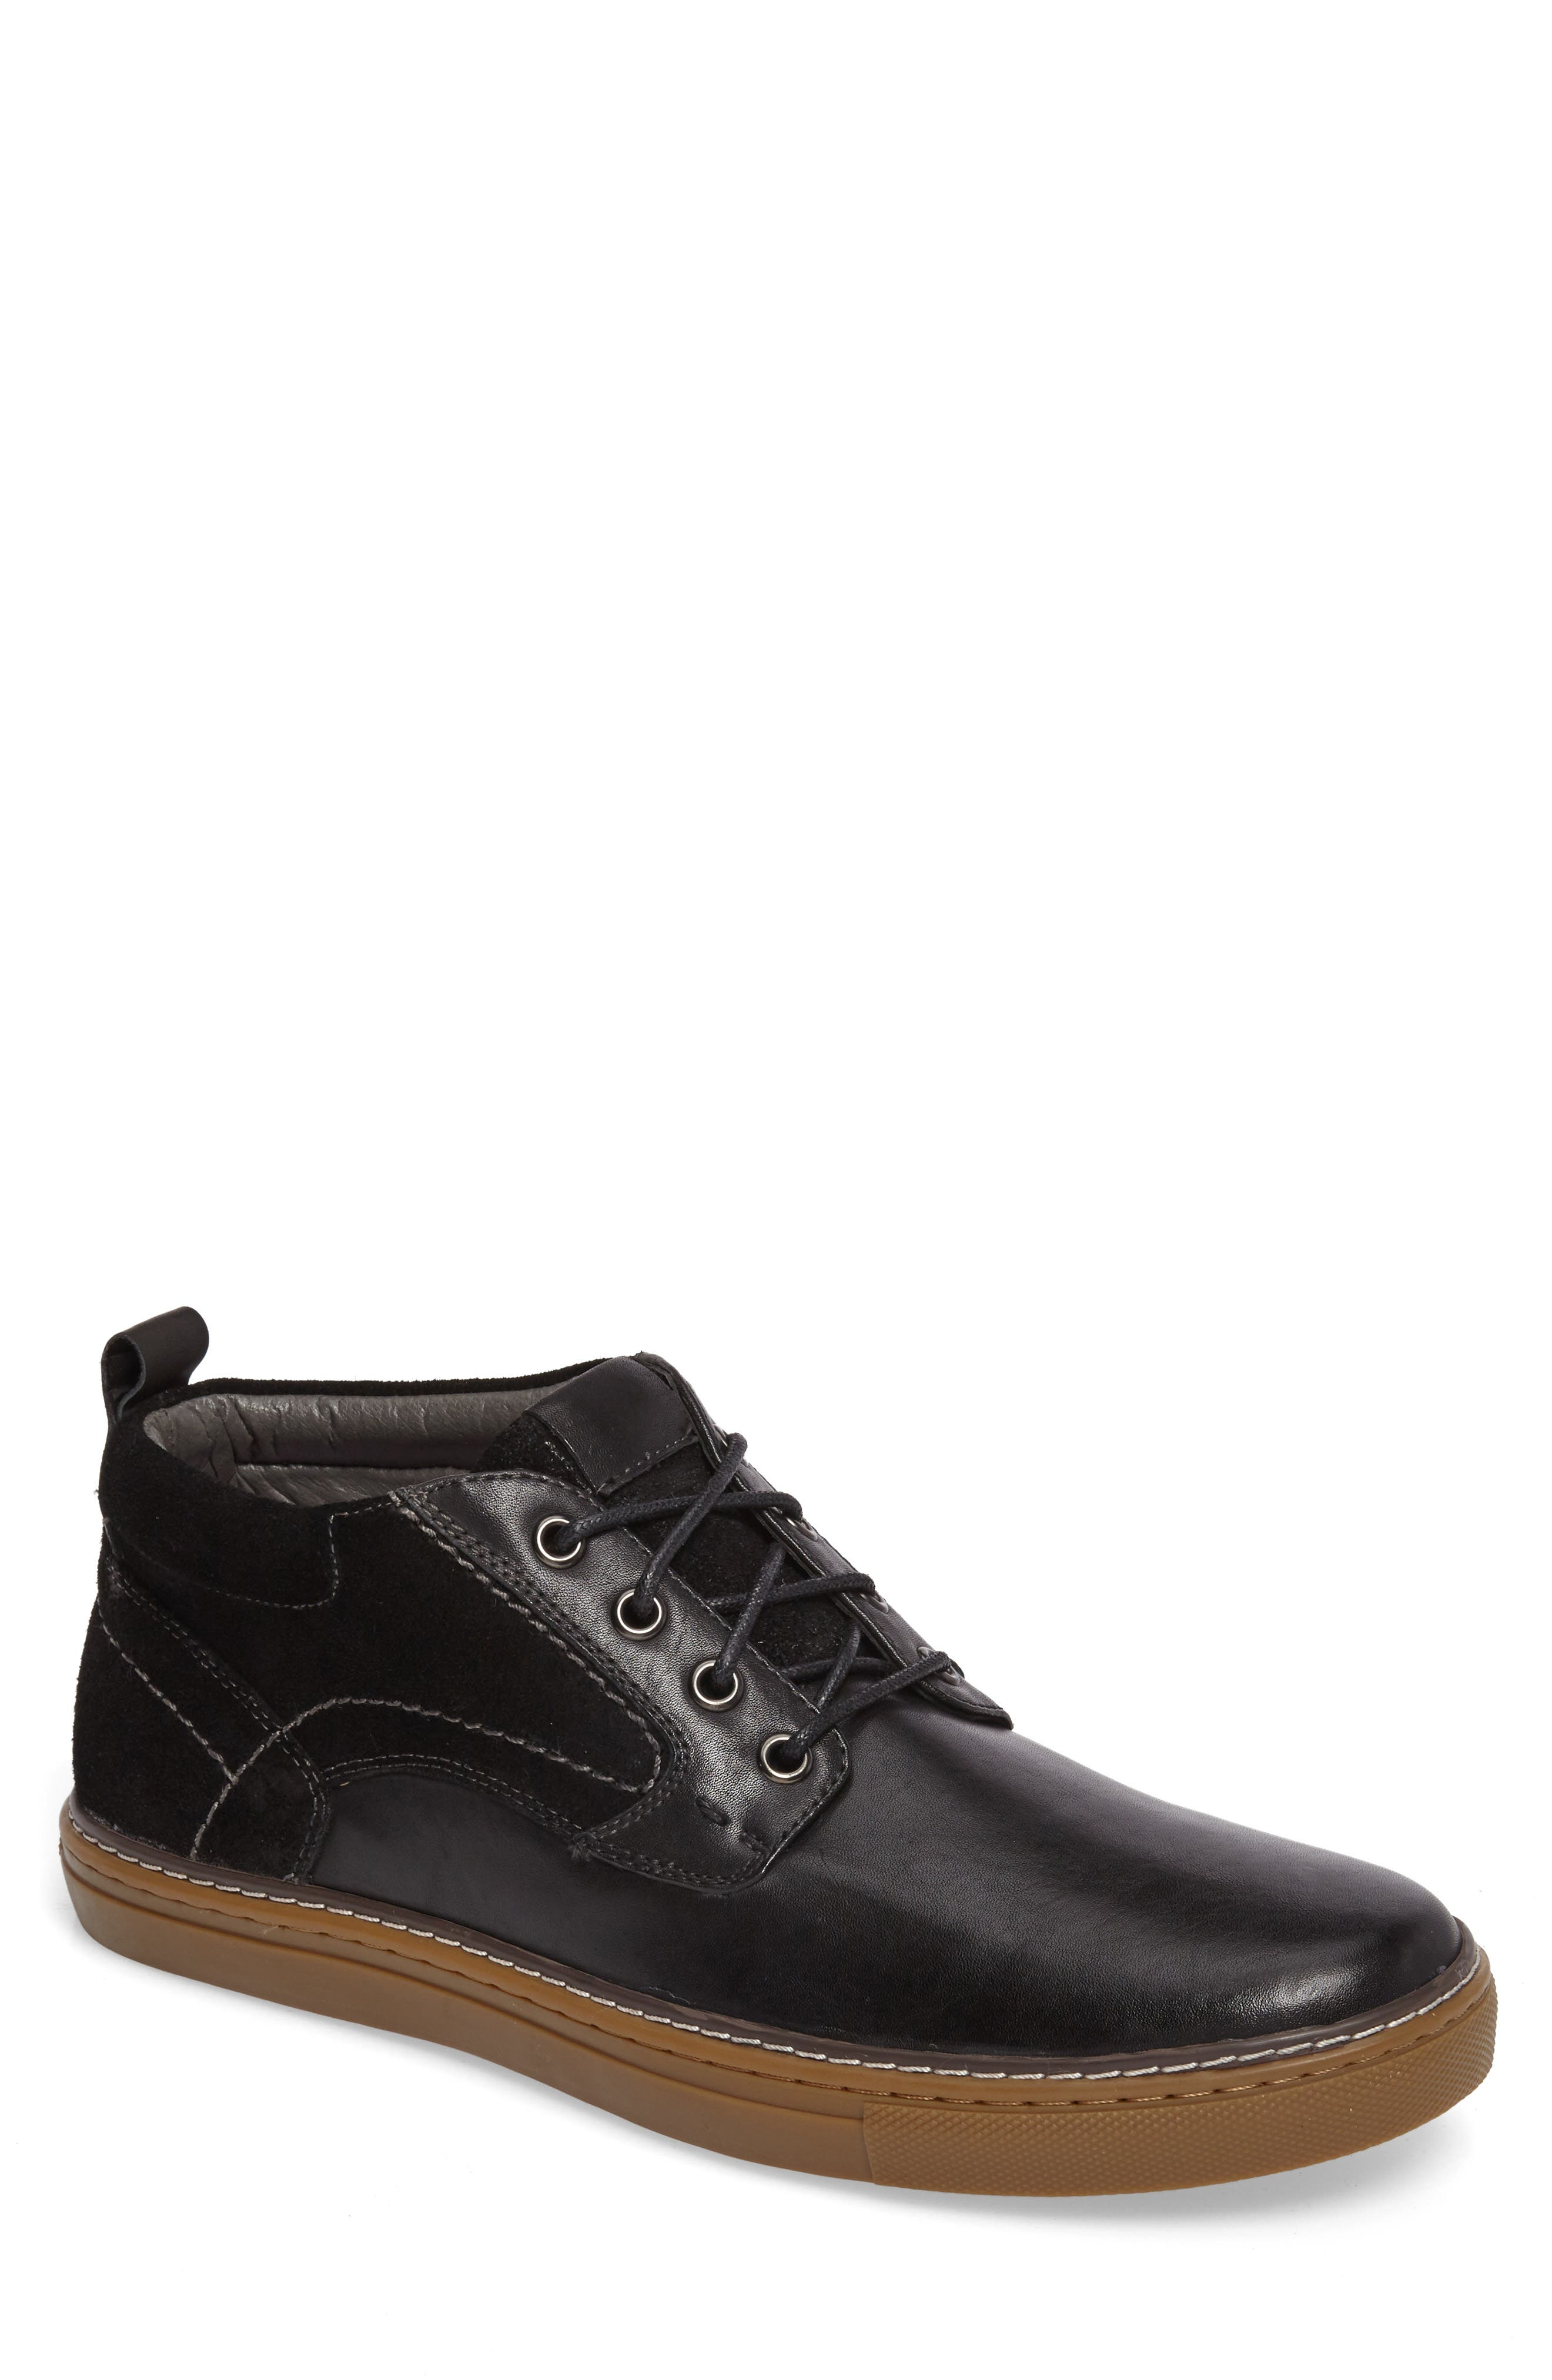 English Laundry Tindal Chukka Sneaker Boot (Men)